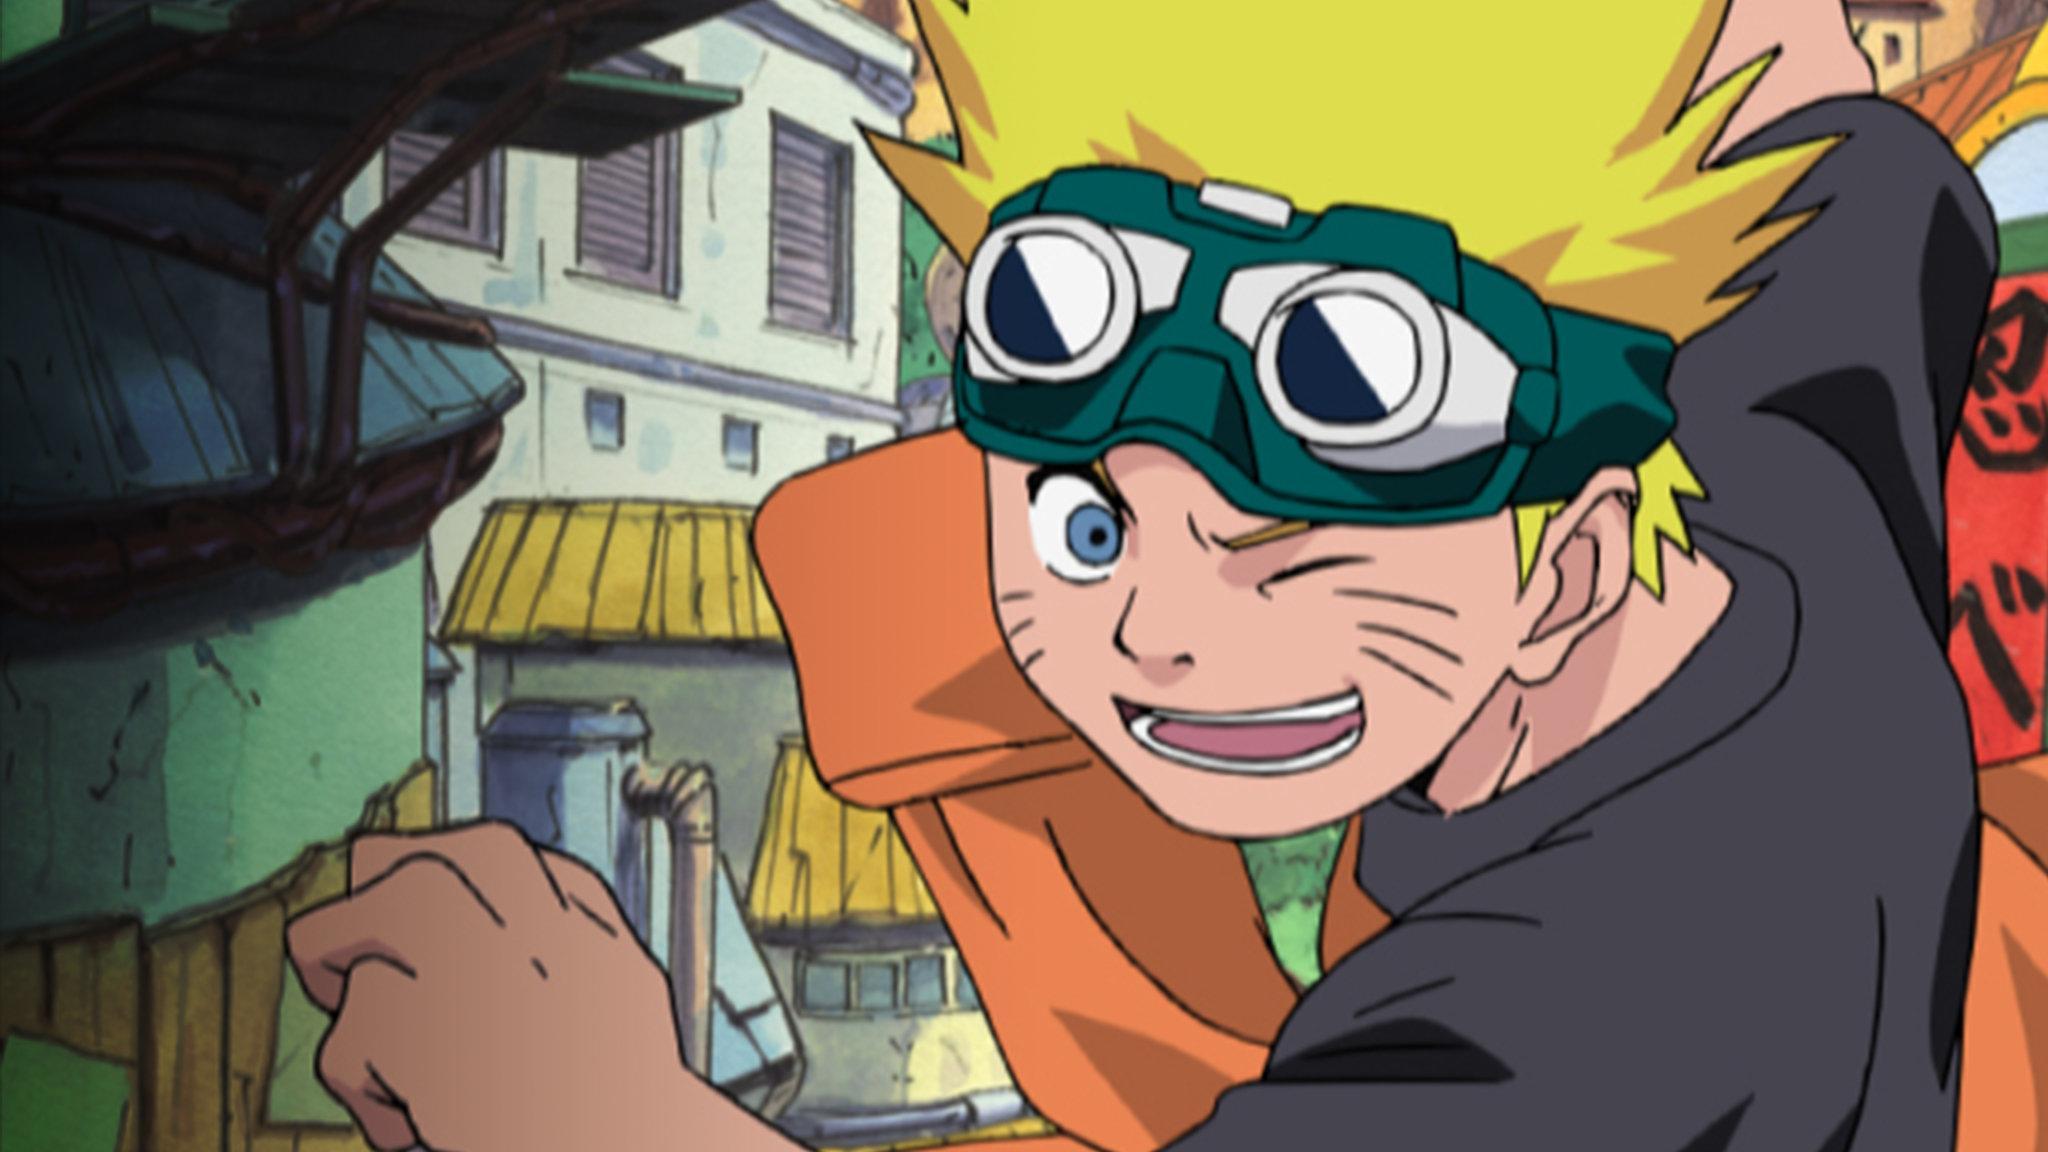 Naruto Shippuden movie order